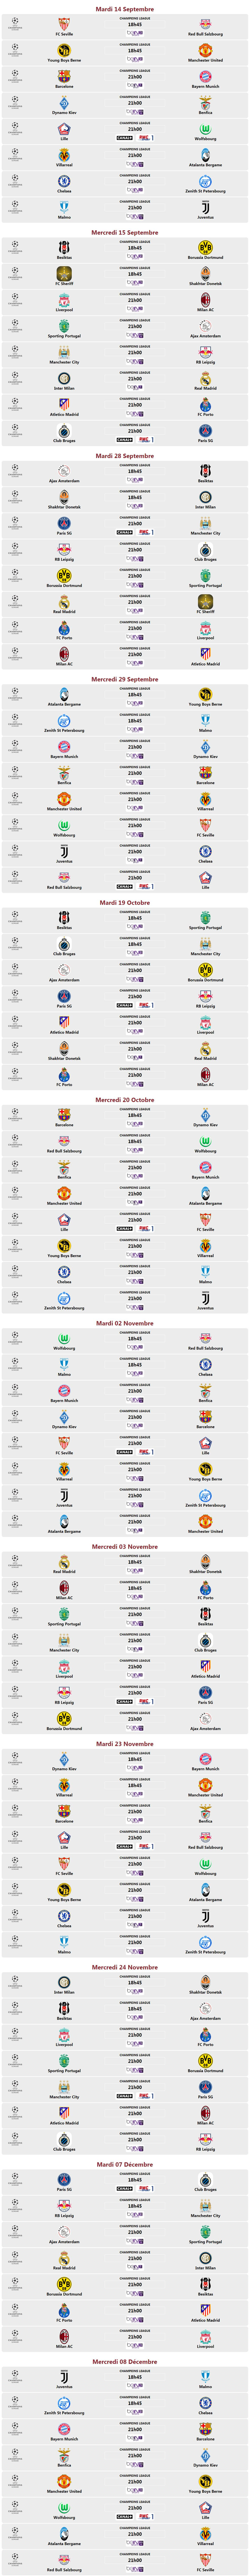 CALENDRIER CHAMPIONS LEAGUE 2021-2022